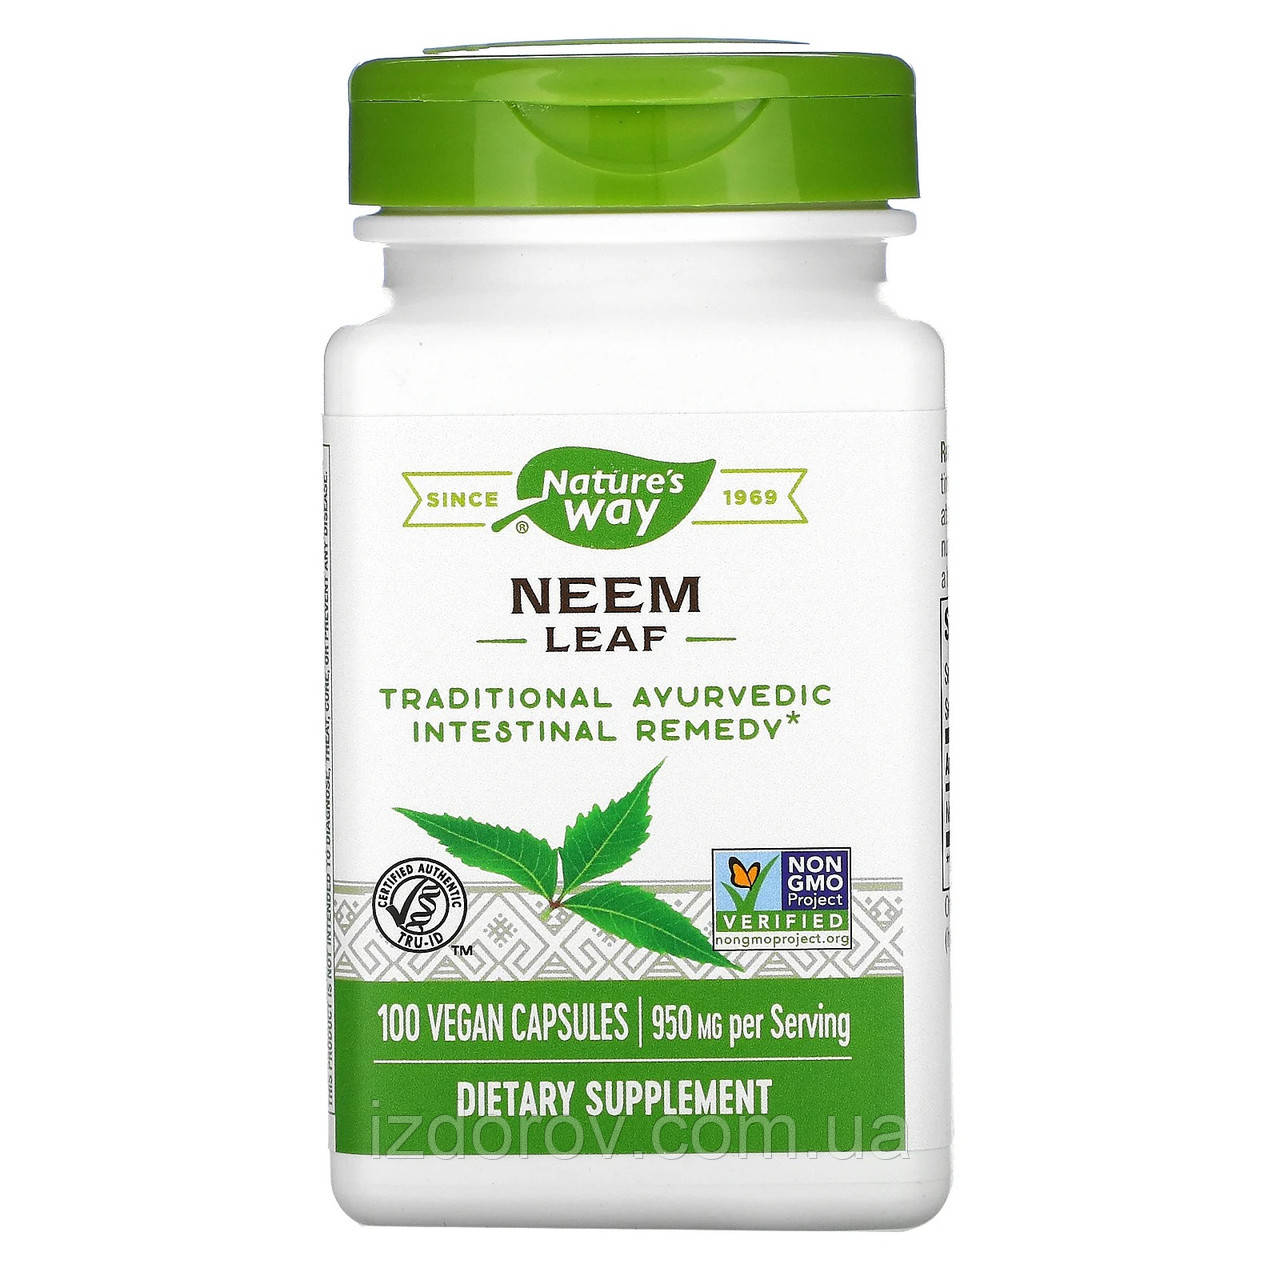 Nature's Way, Лист Німа, 950 мг, Neem Leaf, 100 капсул вегетаріанських